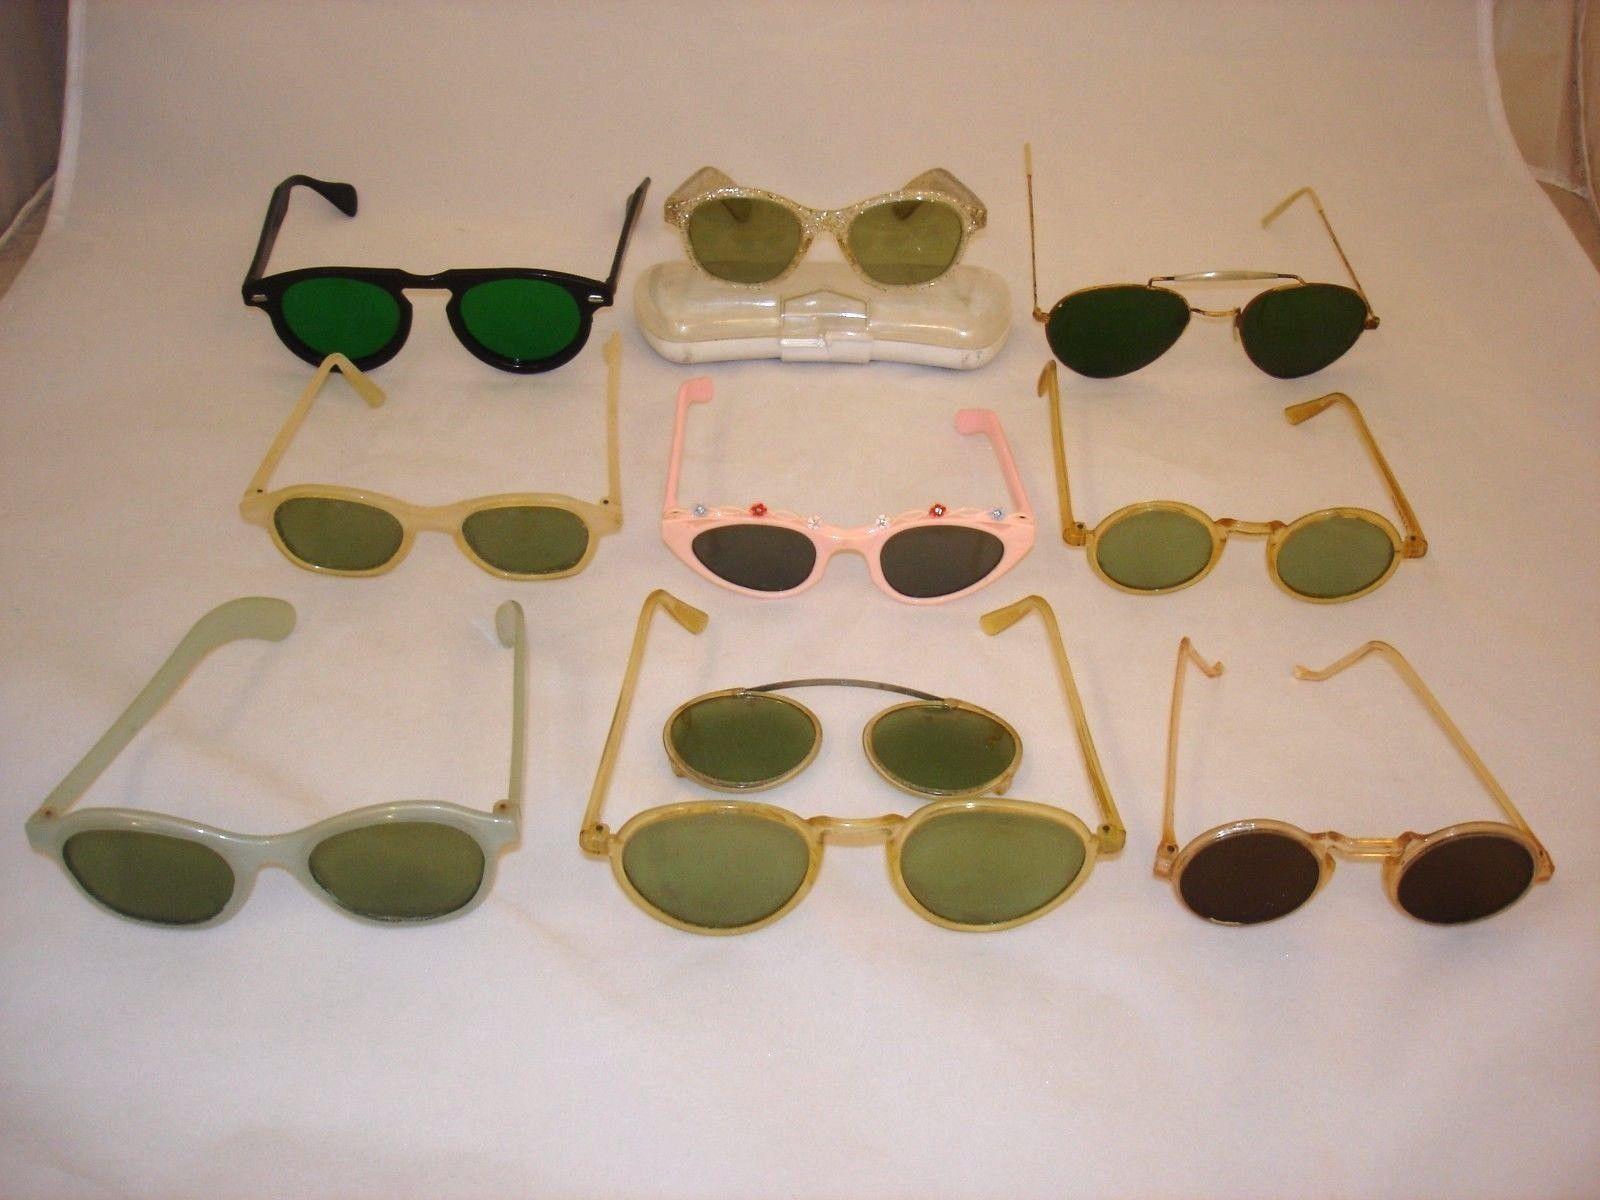 Lot 10 Pairs Vintage Antique Sunglasses Eyeglasses Pince Nez Beatles Catseye